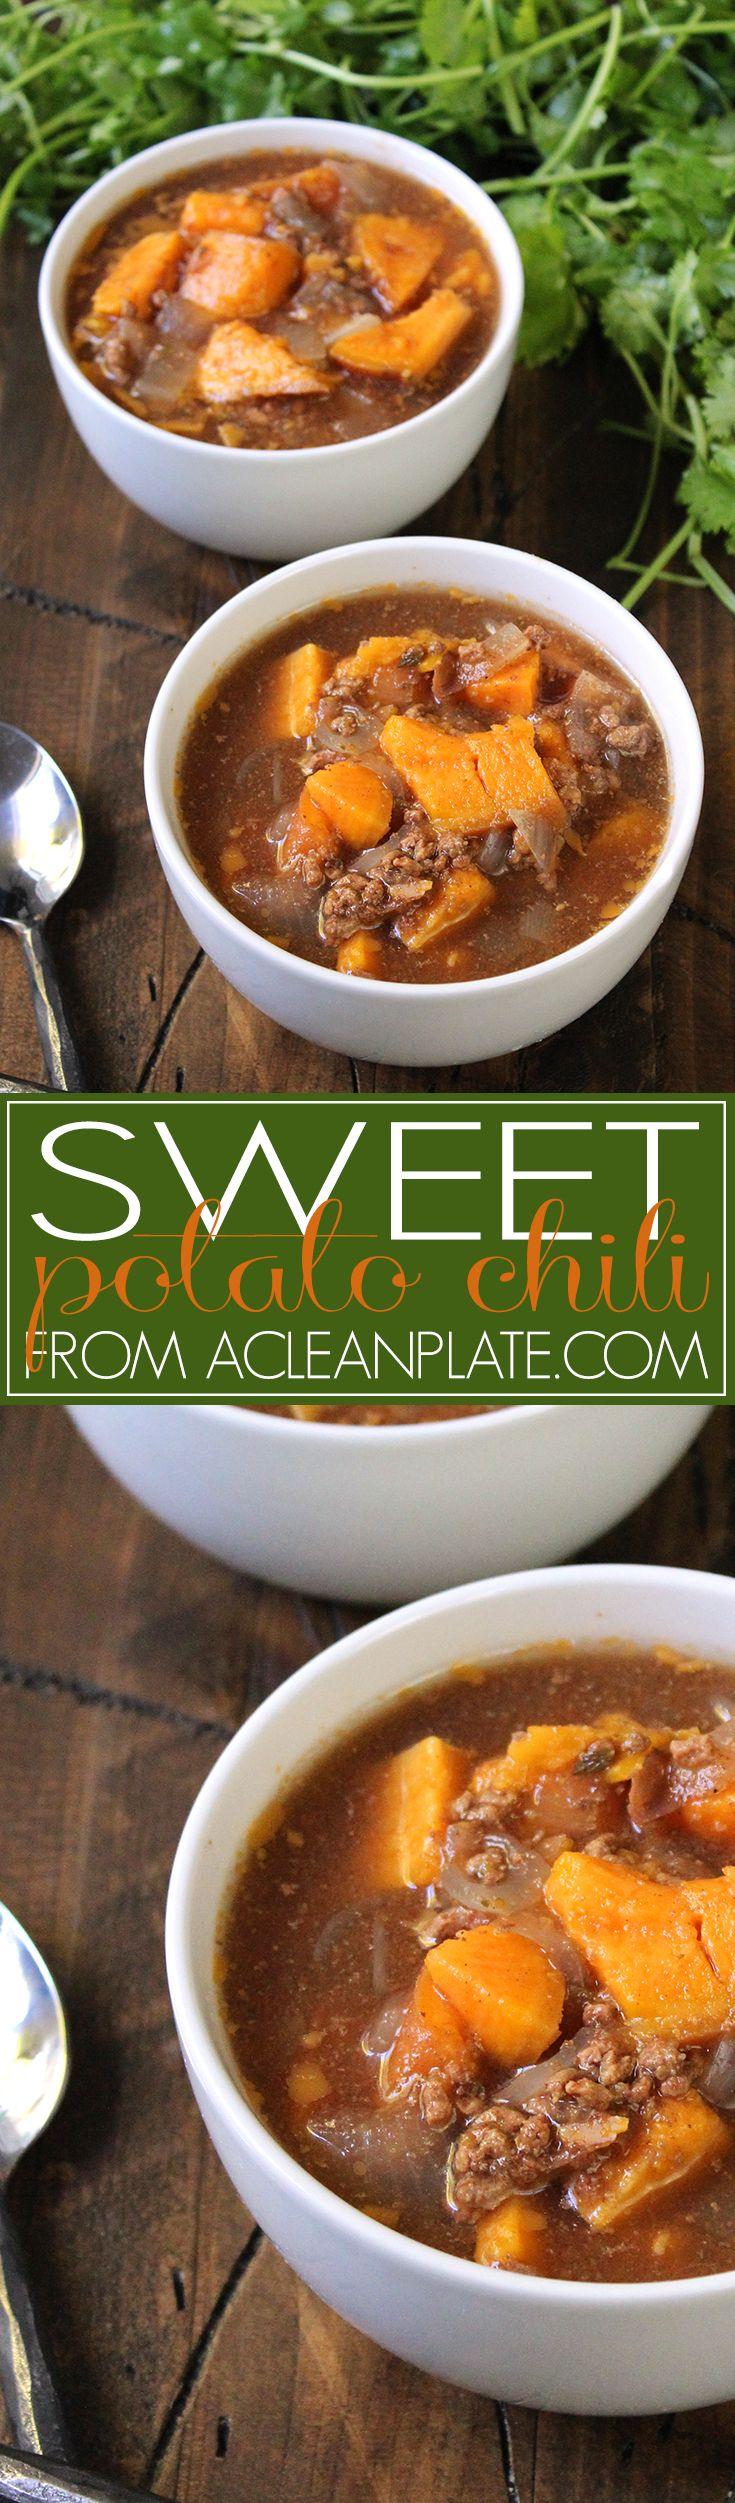 Autoimmune protocol Sweet Potato Chili recipe from A Clean Plate